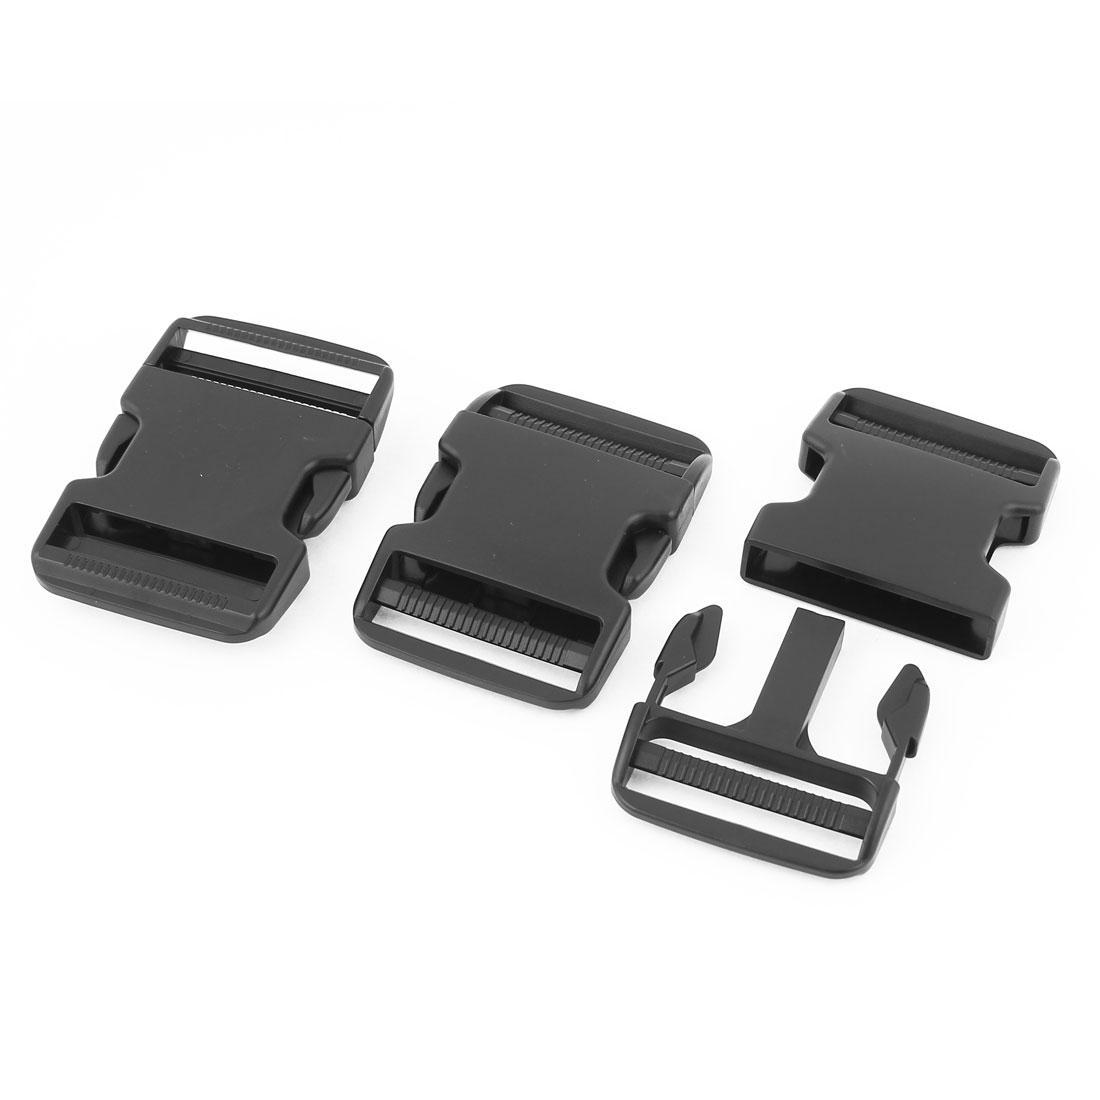 3 Pcs 51mm Width Black Plastic Backpack Rucksack Quick Release Buckle Clip